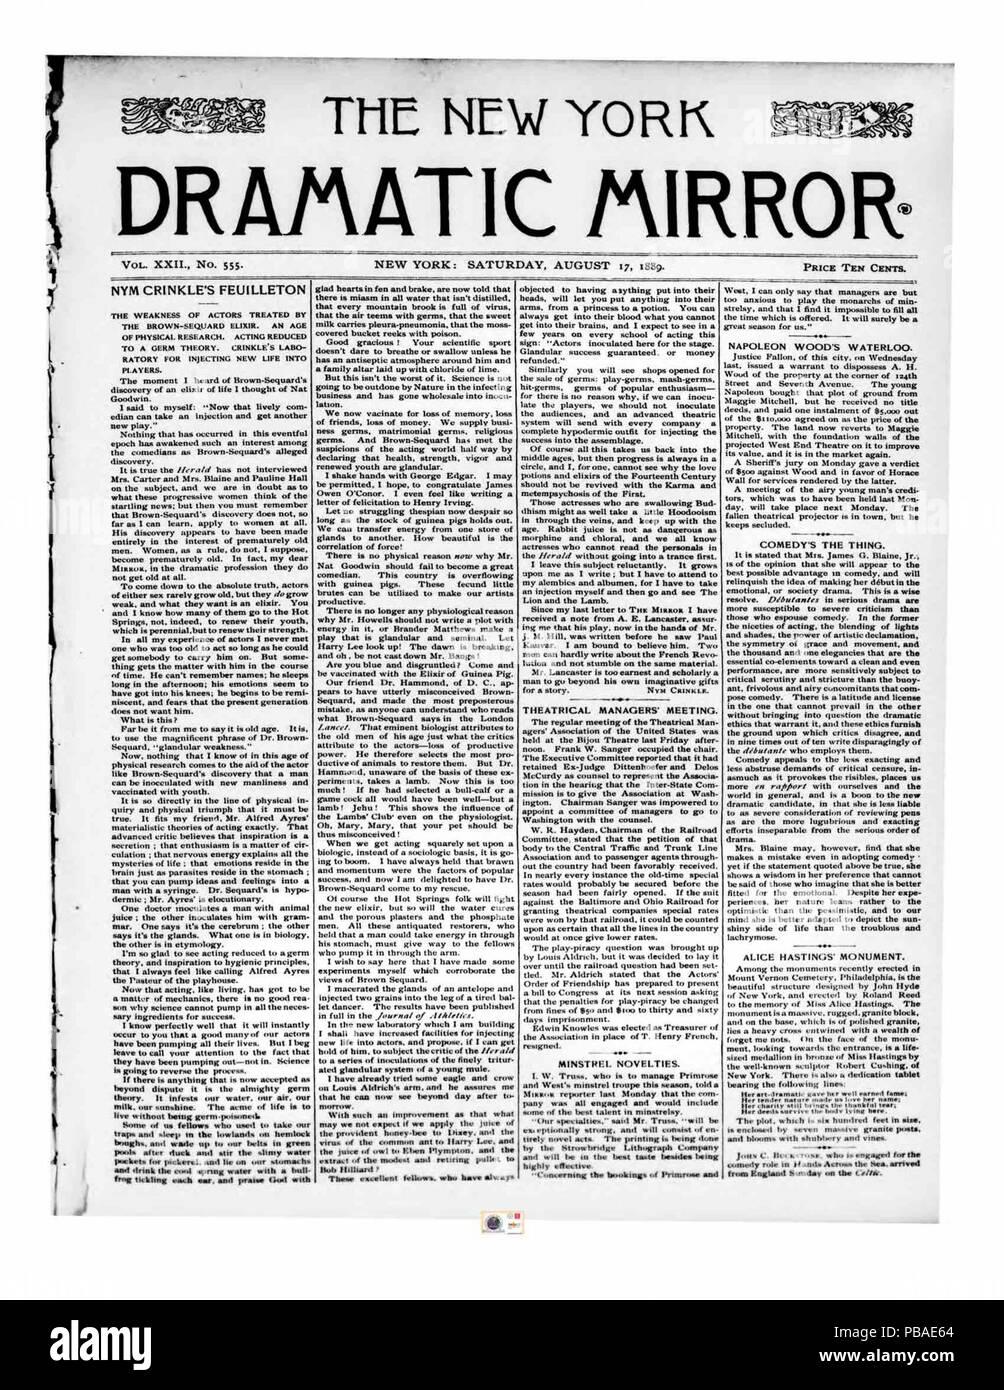 1096 New York Dramatic Mirror 1889-08-17 p. 1